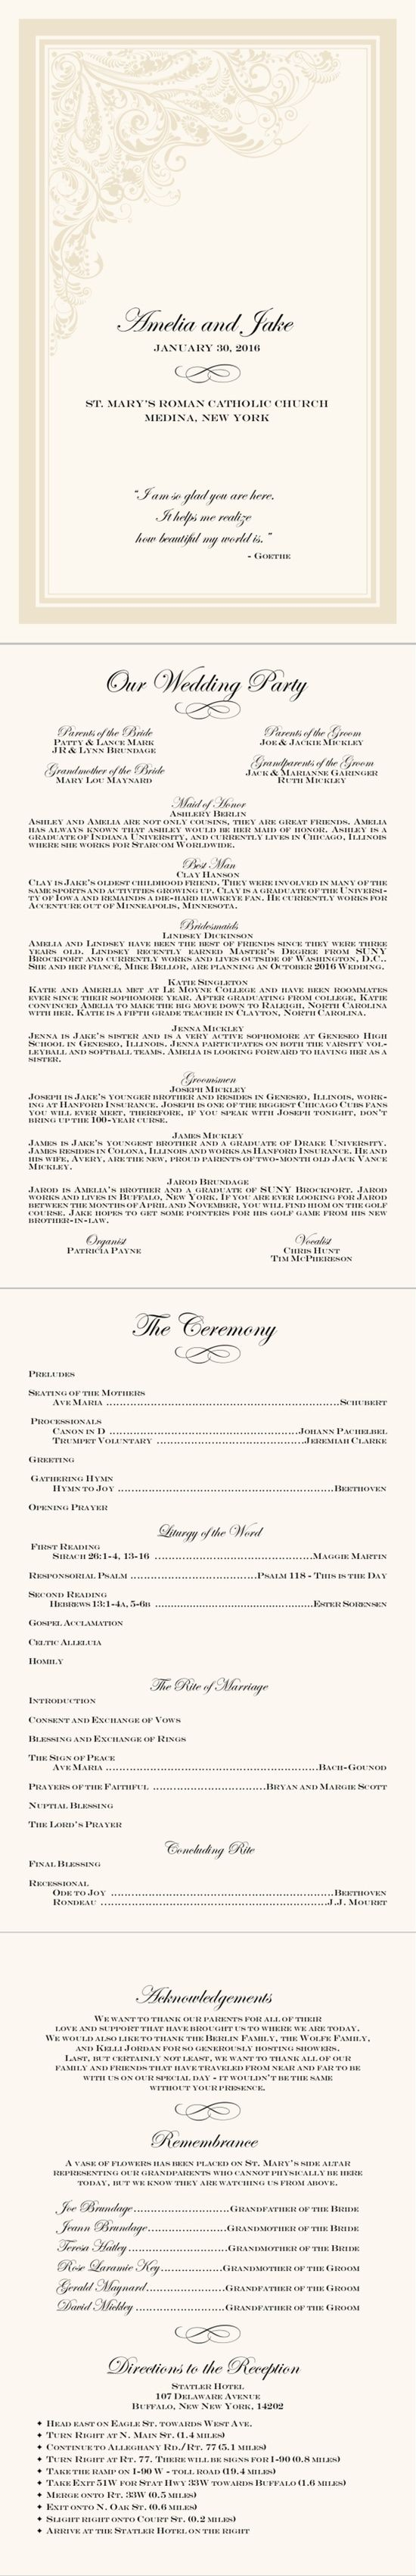 Catholic wedding ceremony layout- cut down for 1/2 mass version